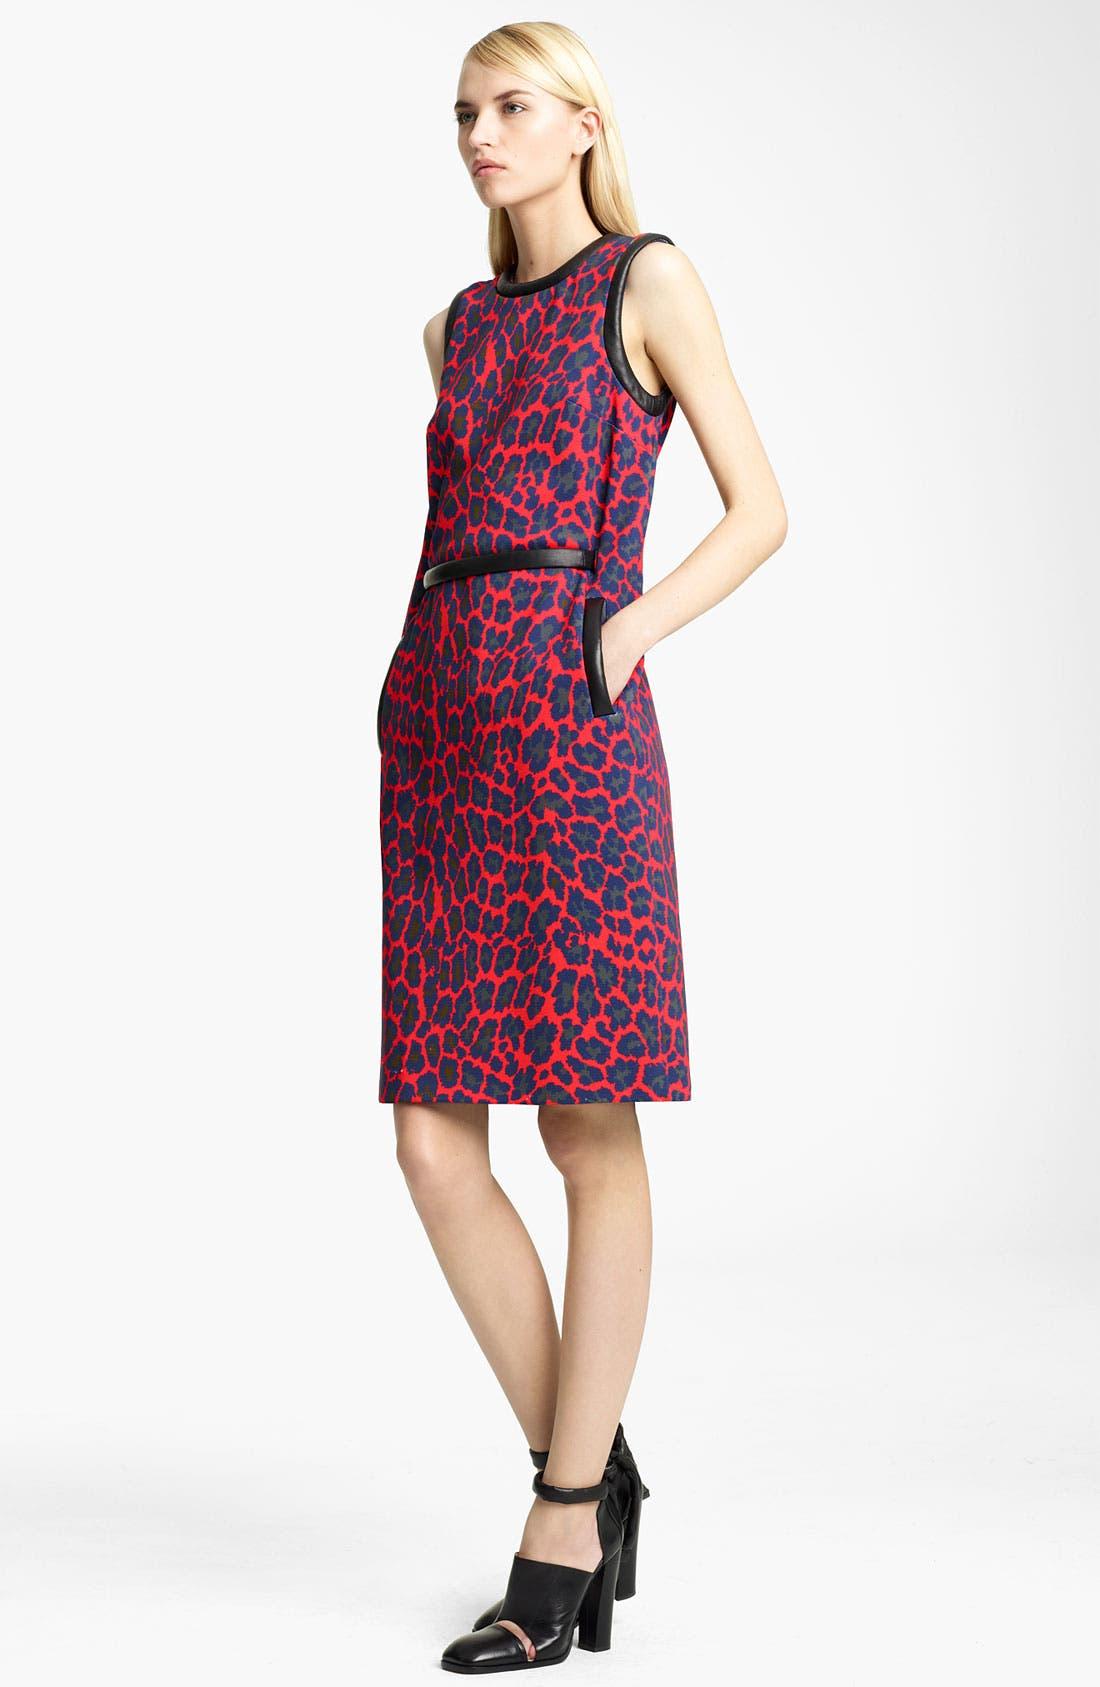 Alternate Image 1 Selected - Christopher Kane Leopard Print Shift Dress